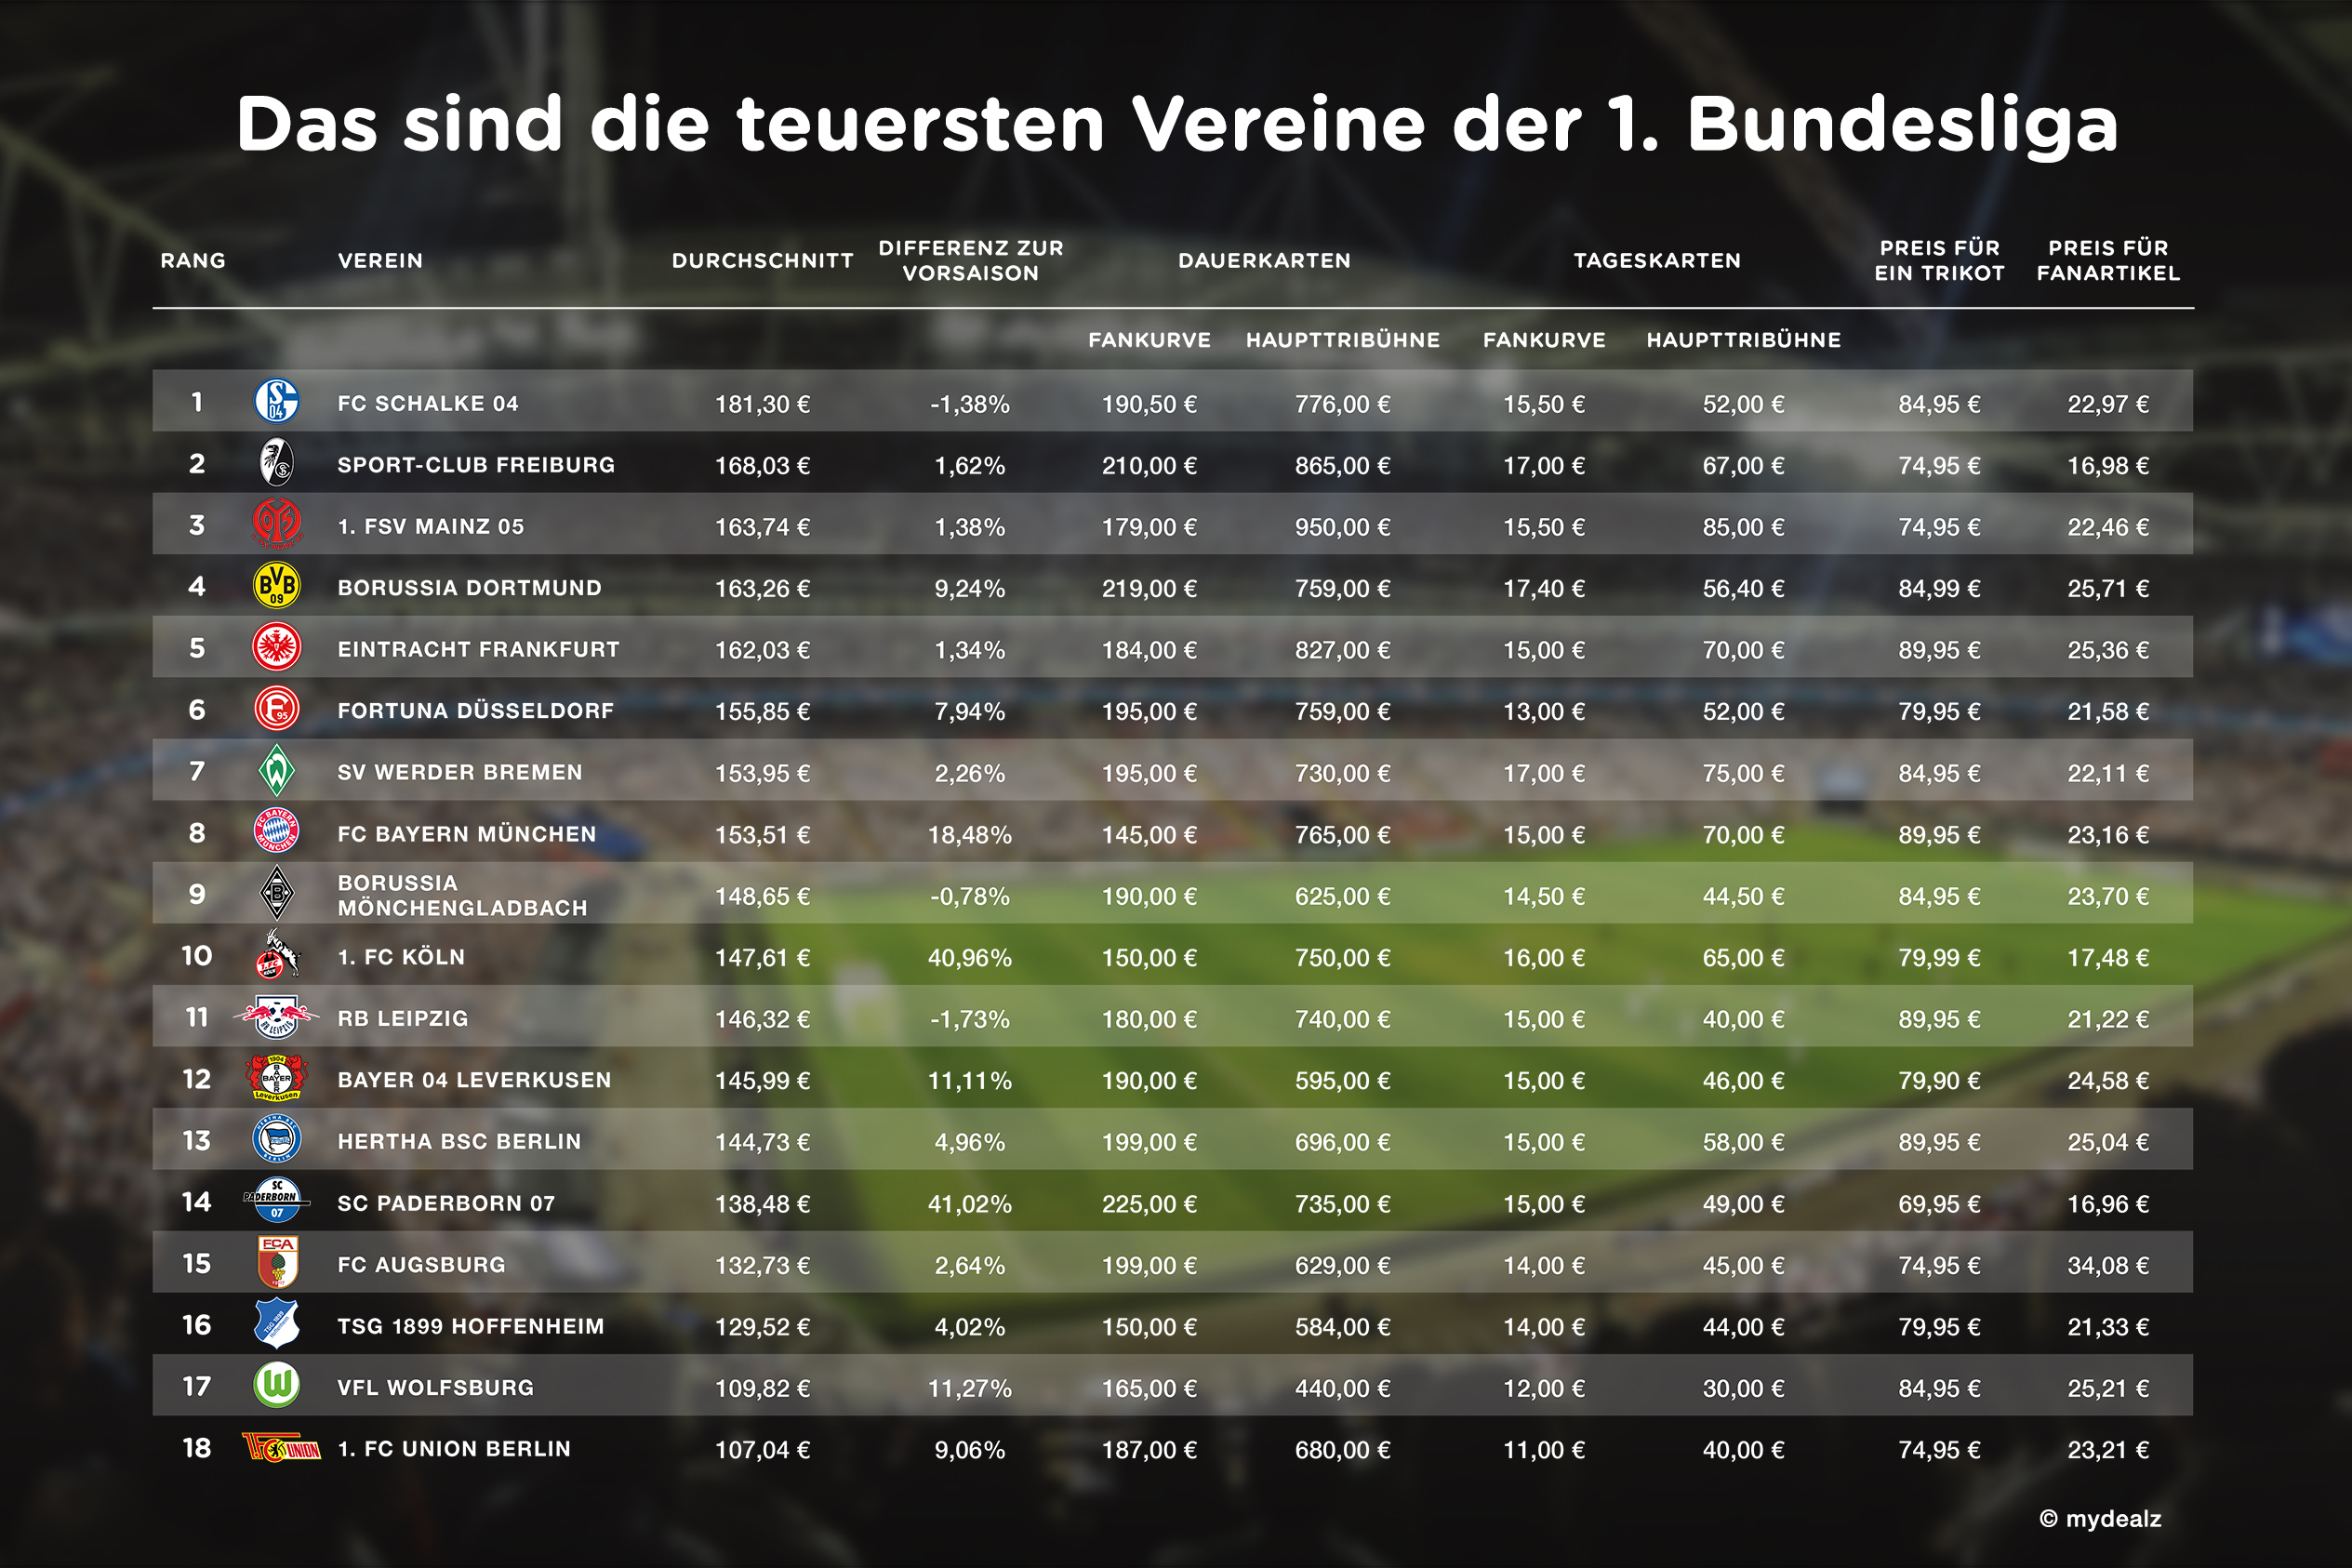 20190812_bundesliga-infographic_300dpi.jpg